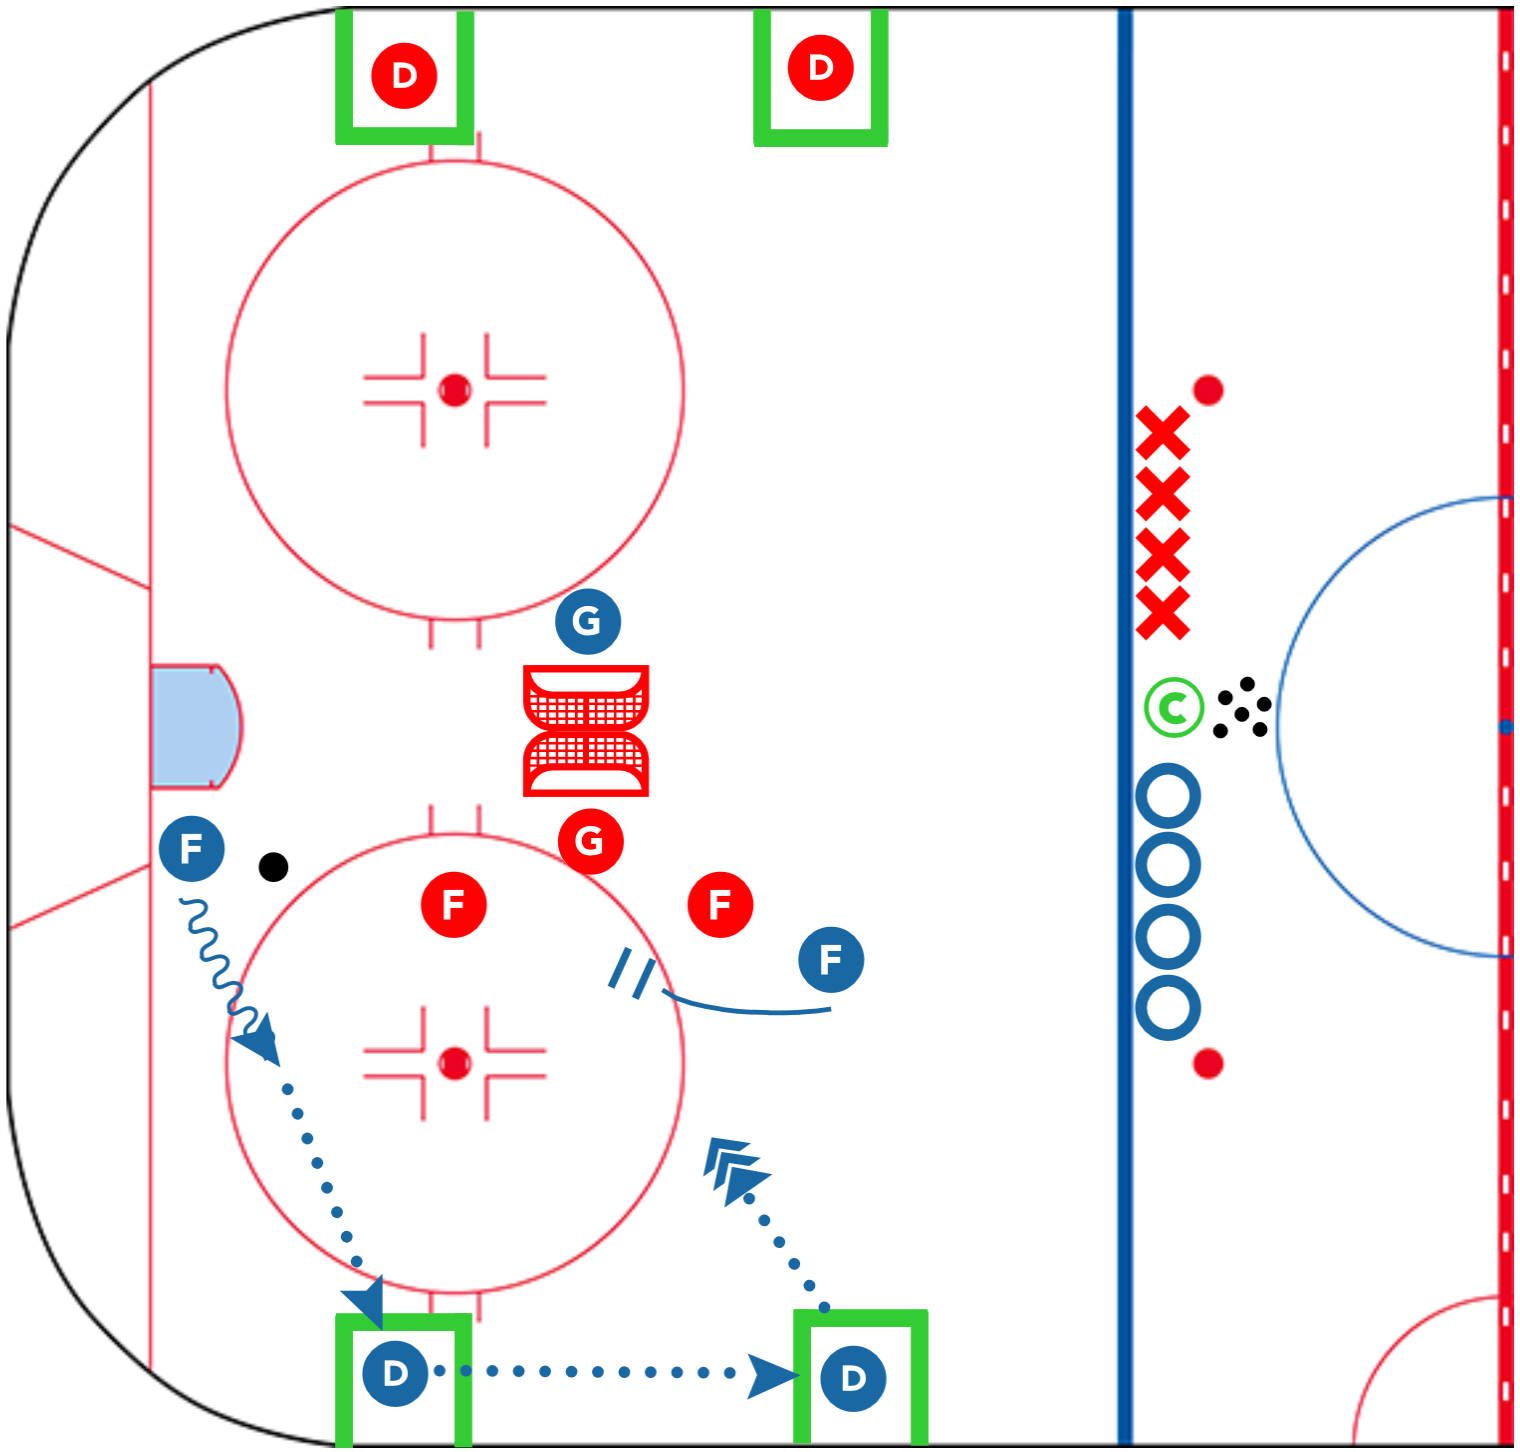 small-area-game-usa-hockey-defensive-zone-CoachThem